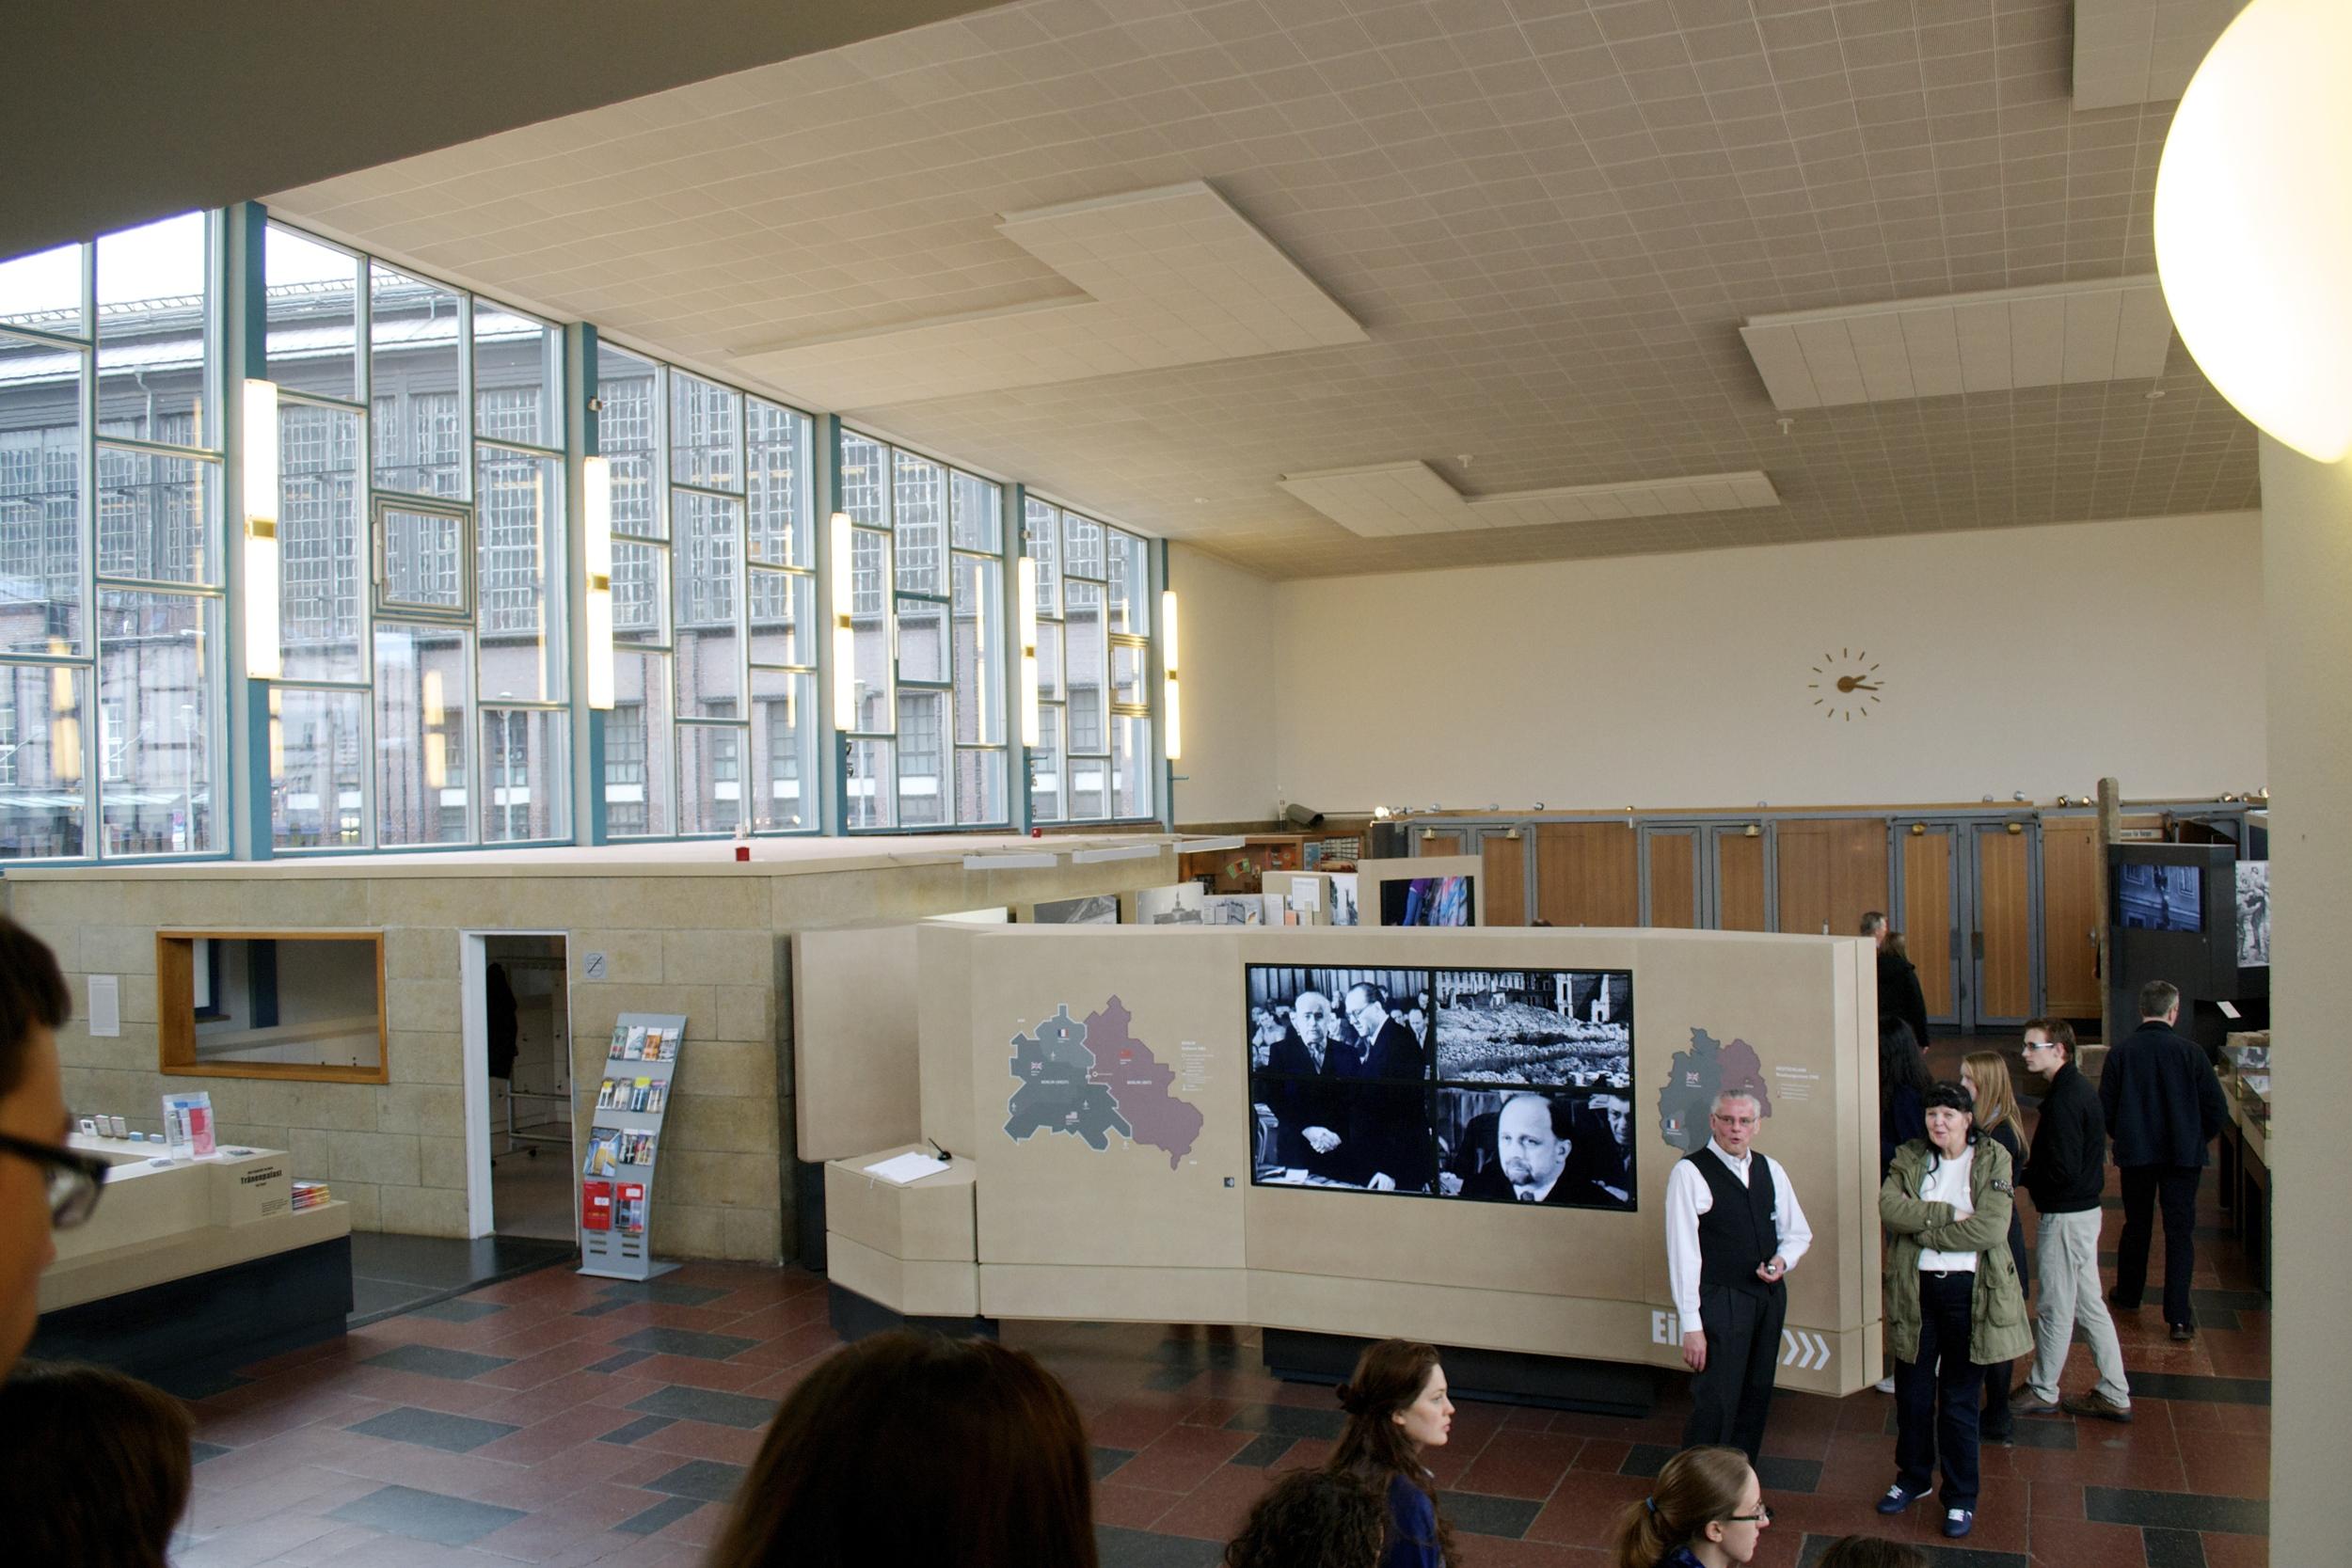 Inside the Tränenpalast Museum